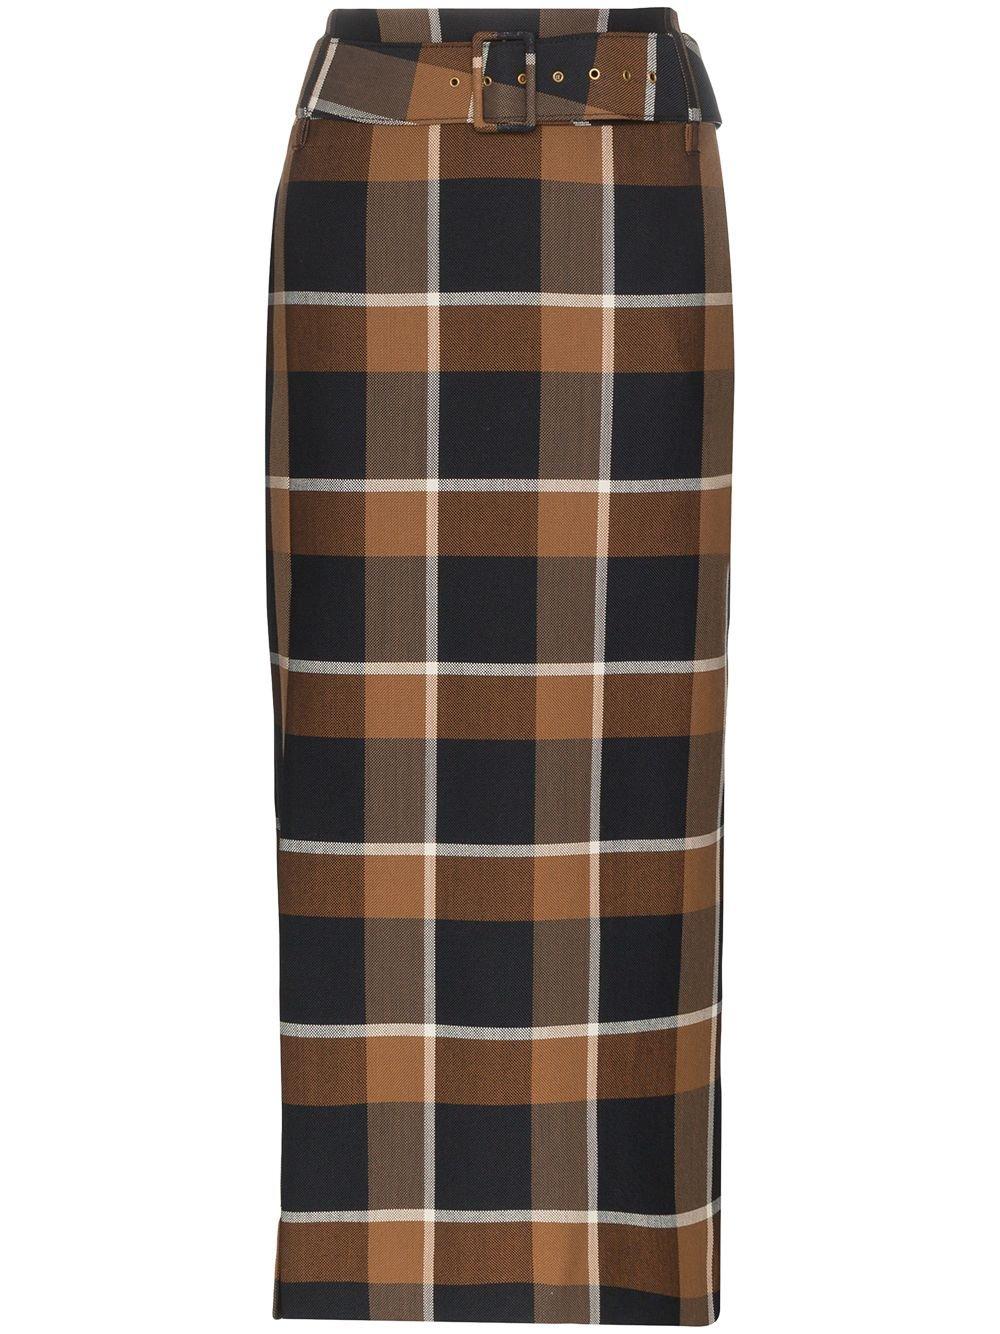 Staud Plaid Belted Midi Skirt | Farfetch.com